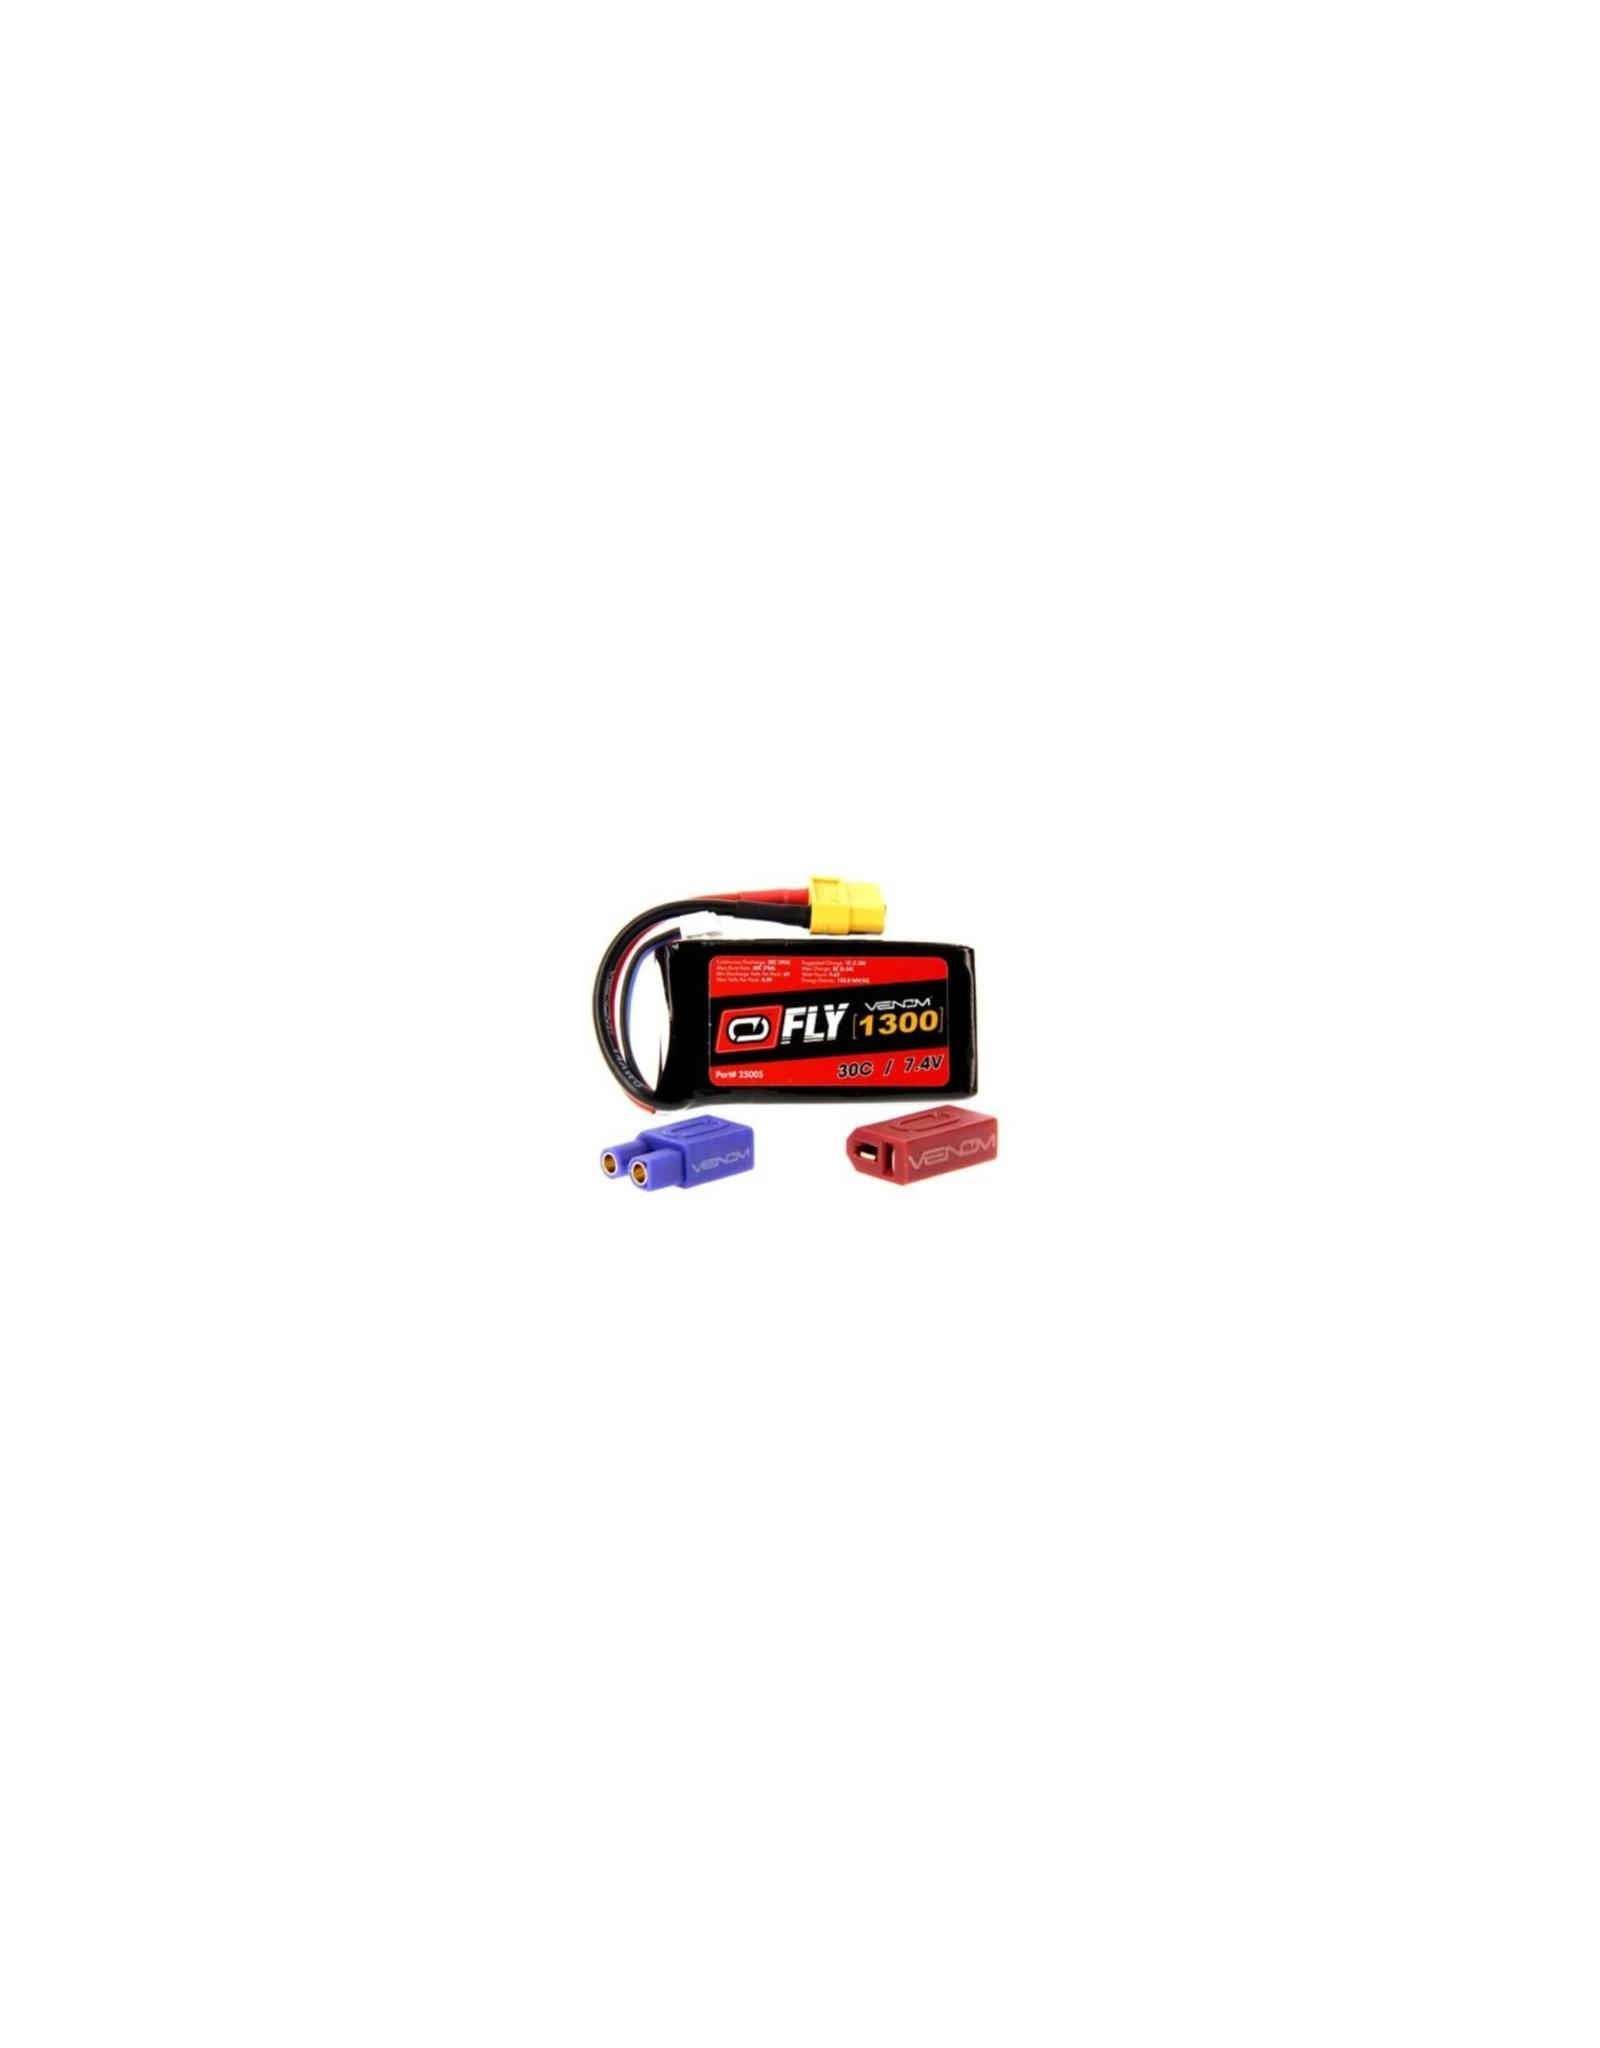 Venom Racing VNR25005 - 7.4V 1300mAh 2S 30C FLY LiPo Battery: UNI 2.0 Plug